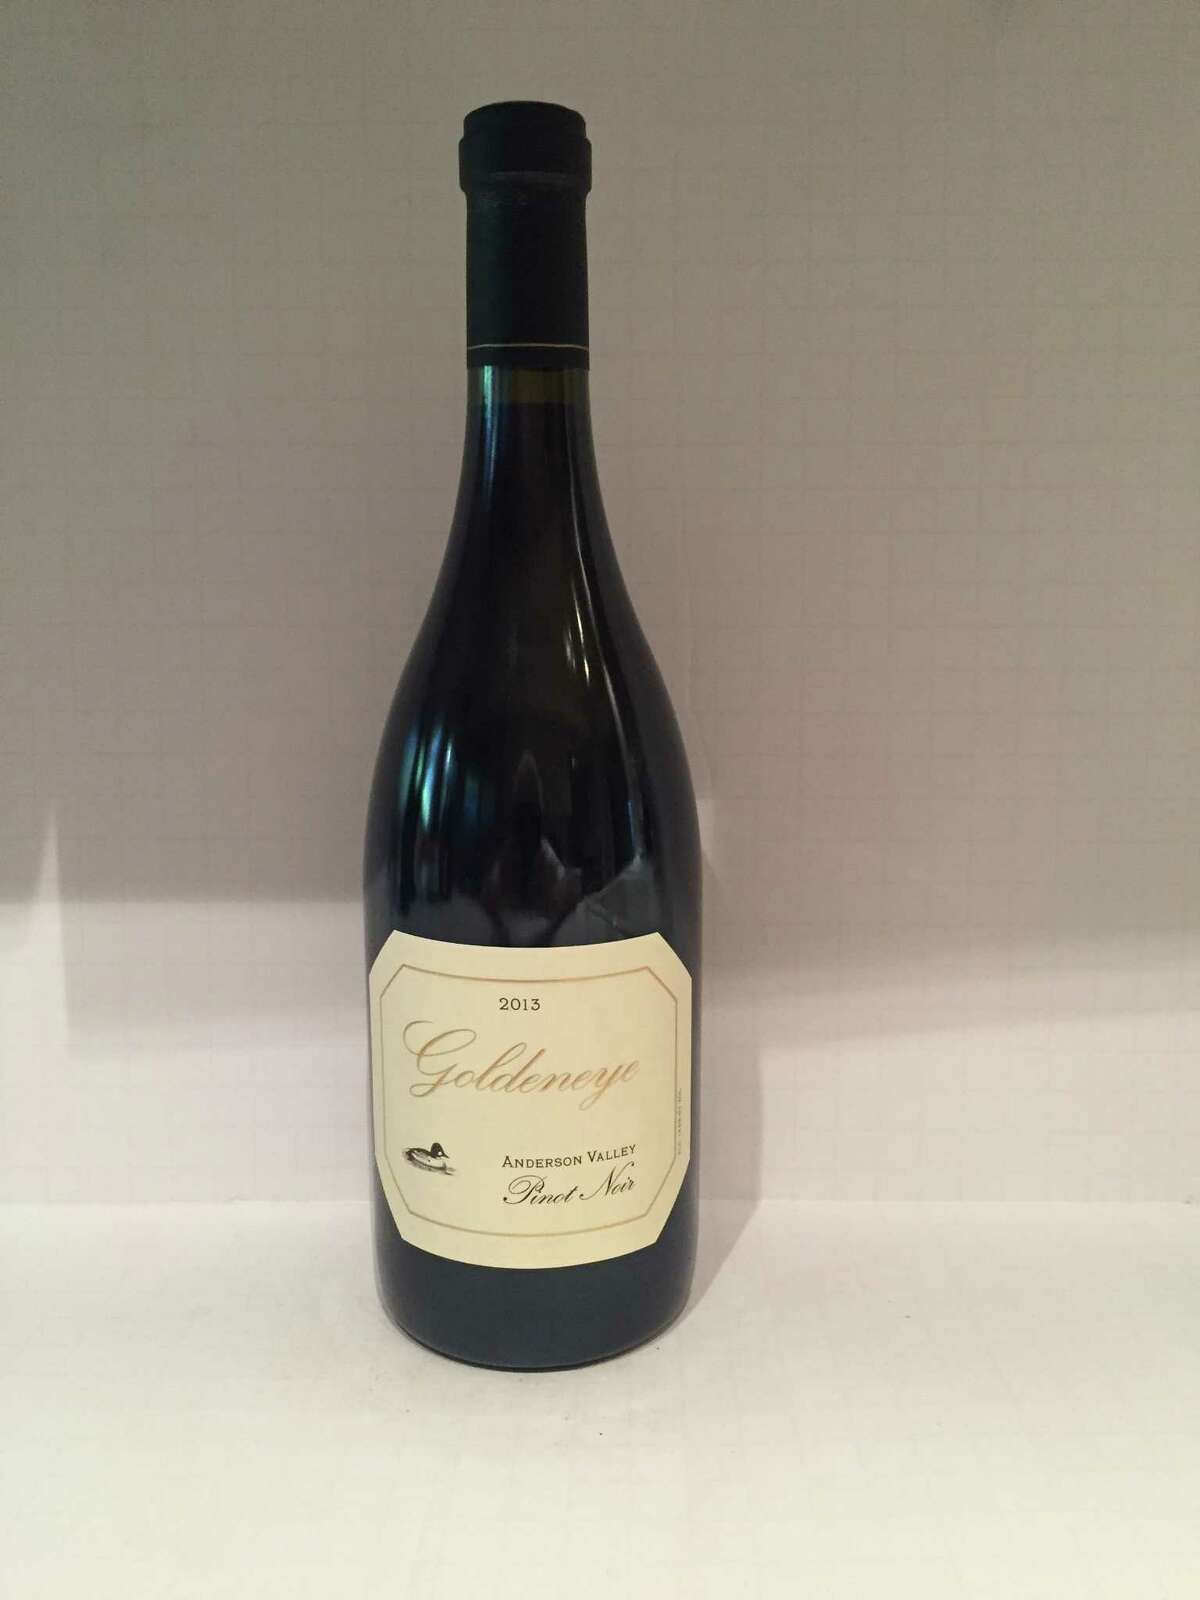 2013 Golden Eye Anderson Valley Pinot Noir